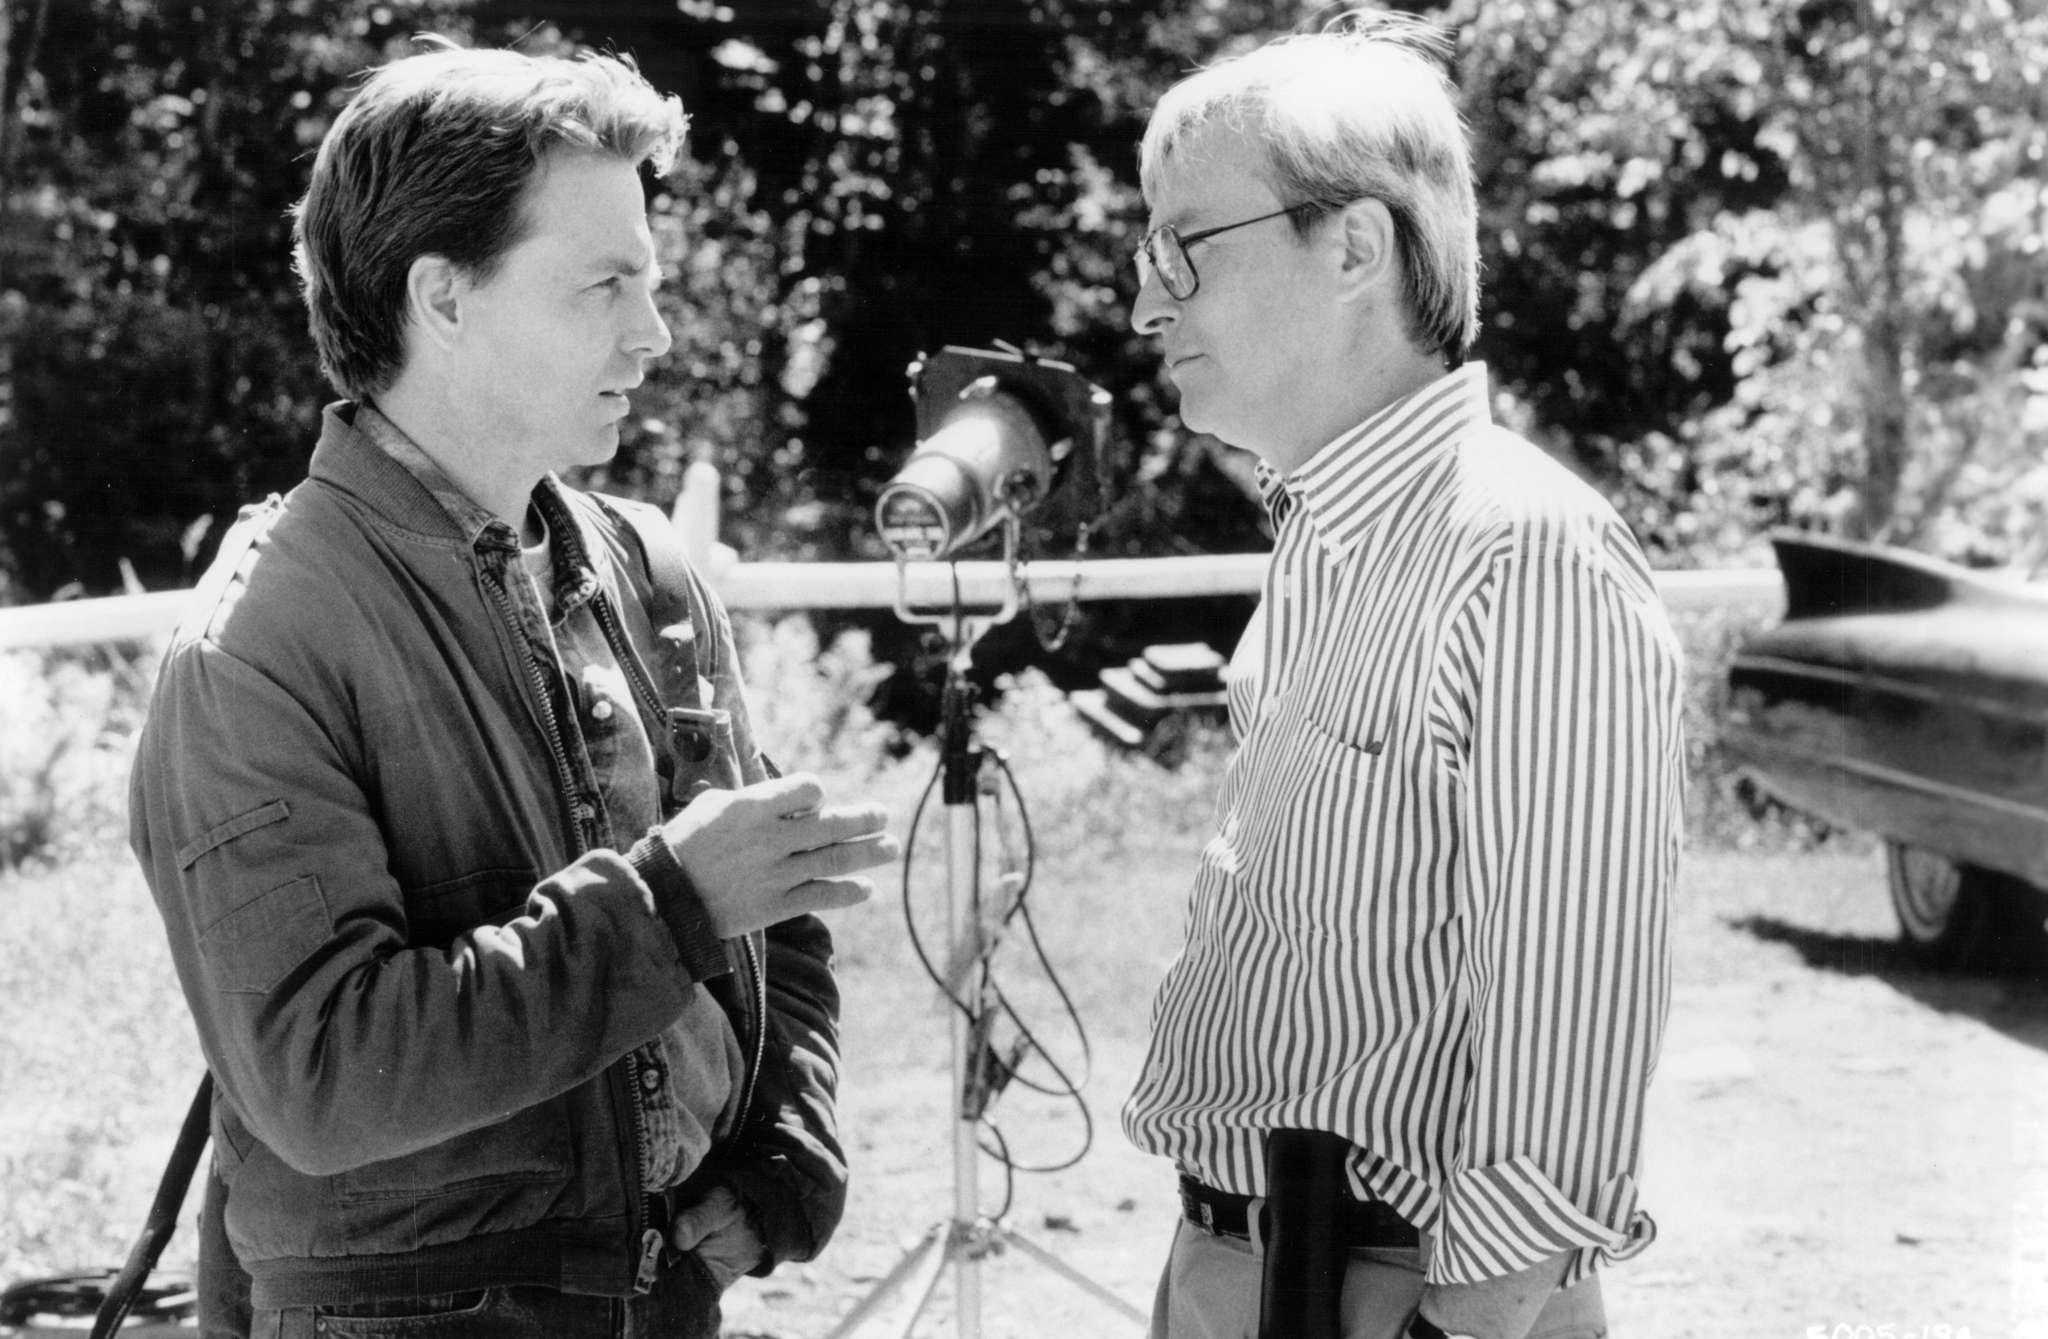 David Andrews and Ralph S. Singleton in Graveyard Shift (1990)